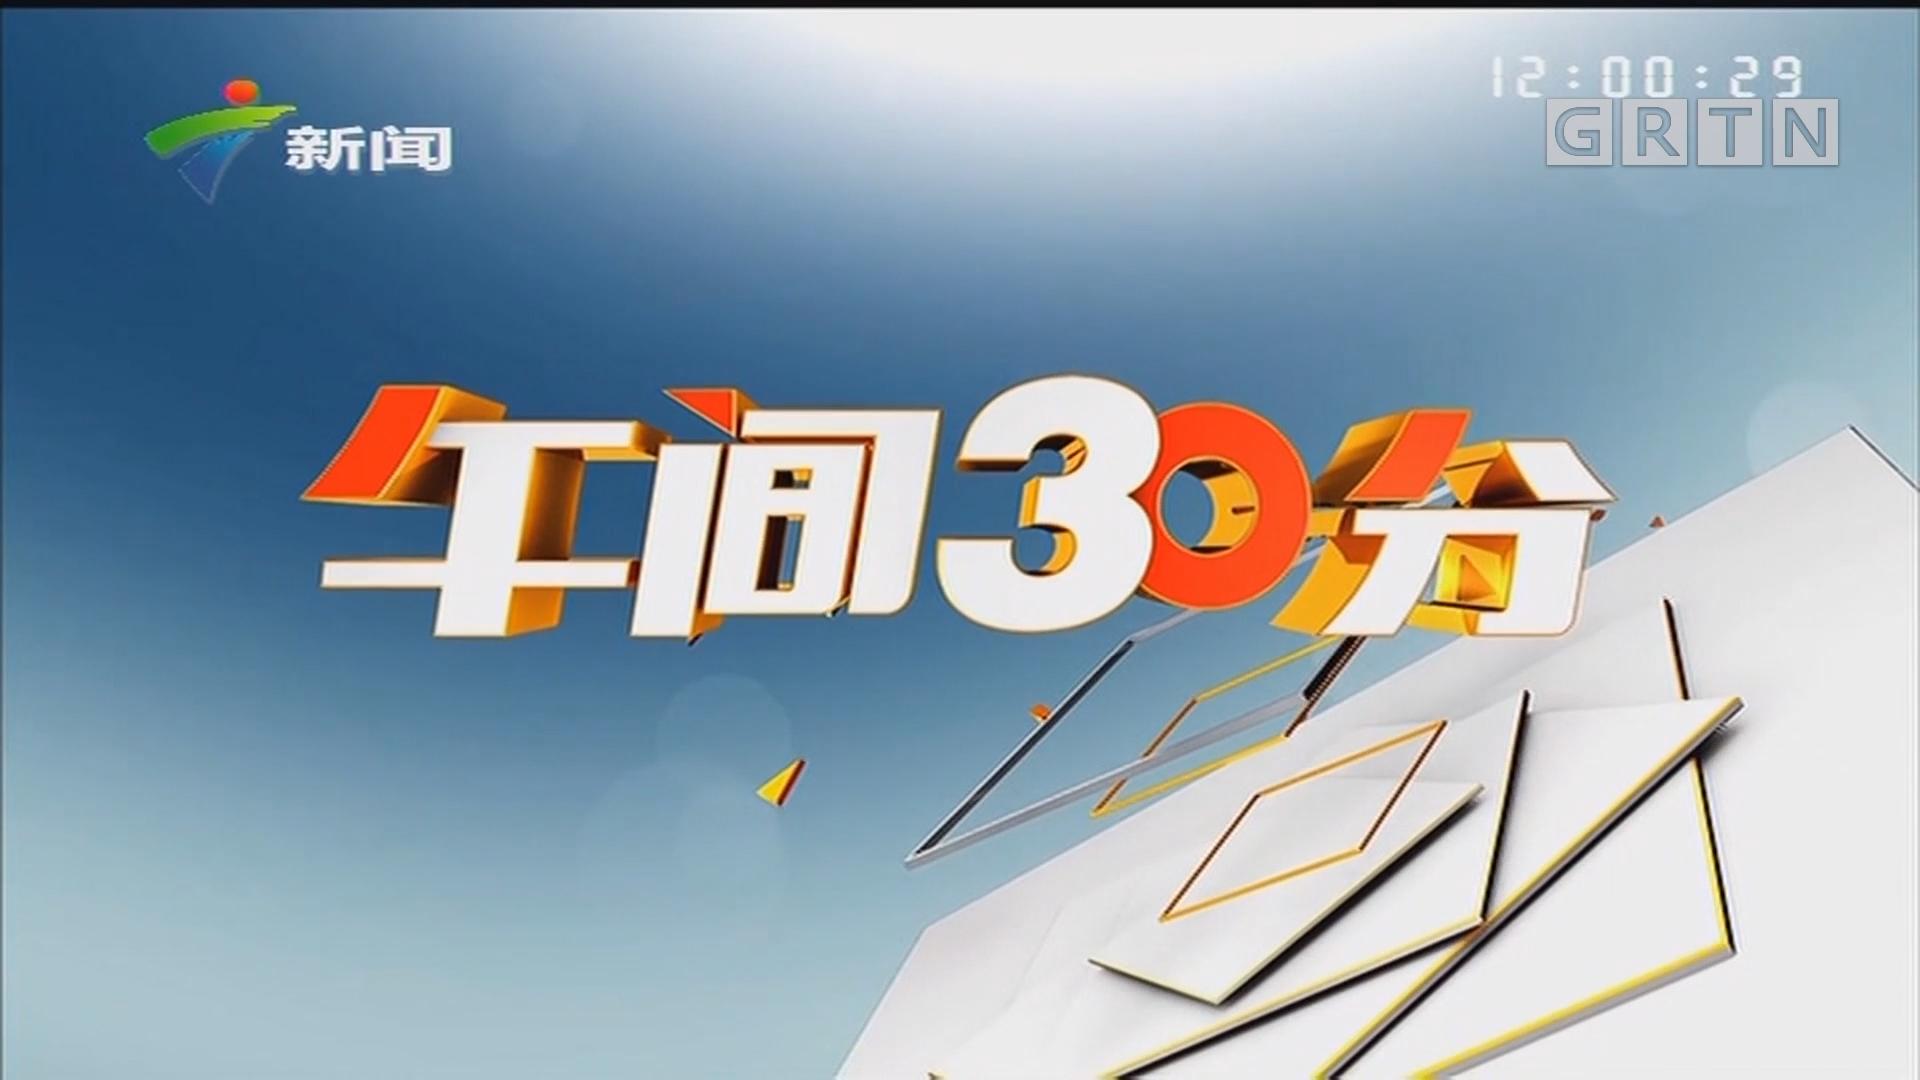 [HD][2019-10-04]午间30分:南粤大地欢庆国庆巡礼:广东各地举办多场活动 庆祝新中国成立70周年